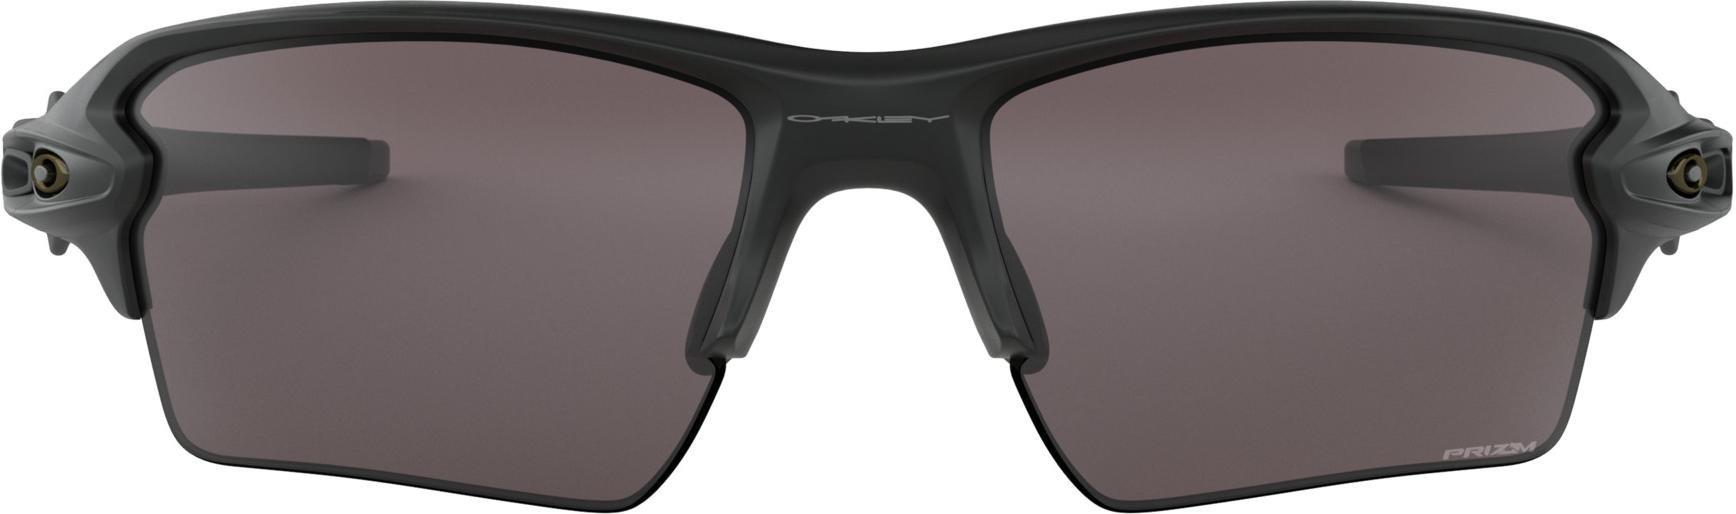 Occhiali da sole Oakley Flak 2.0 XL Top4Fitness.it